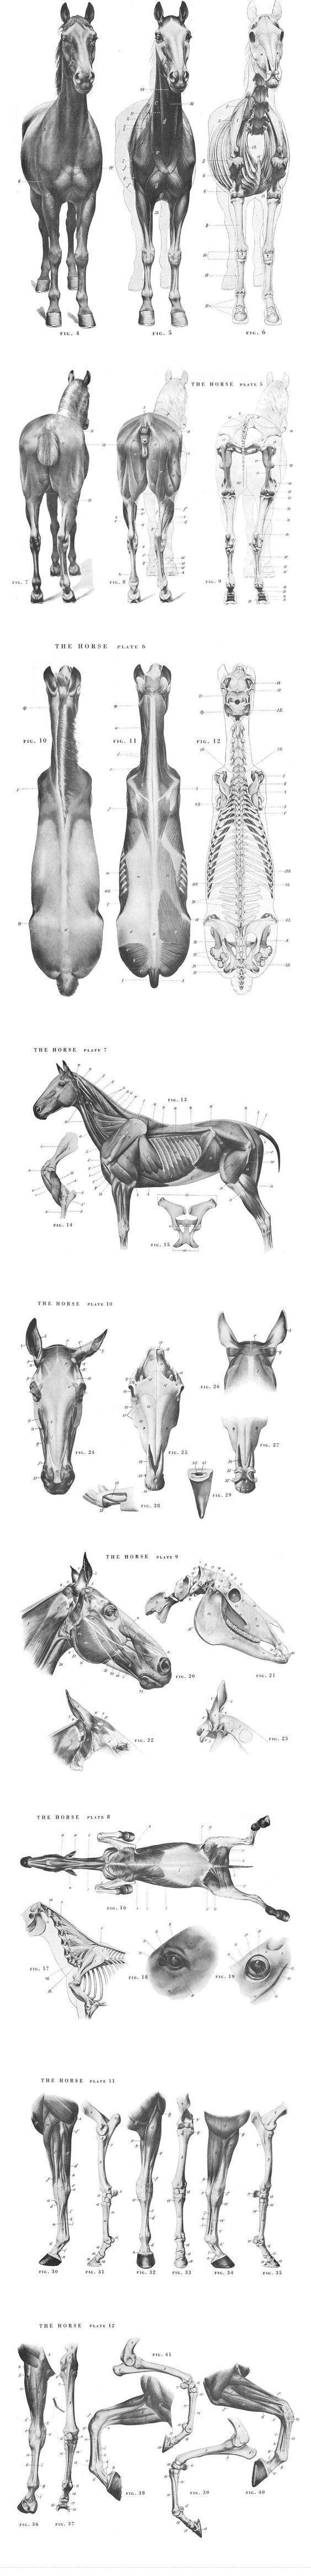 horse anatomy: | dibujos de caballos | Pinterest | Horse anatomy ...